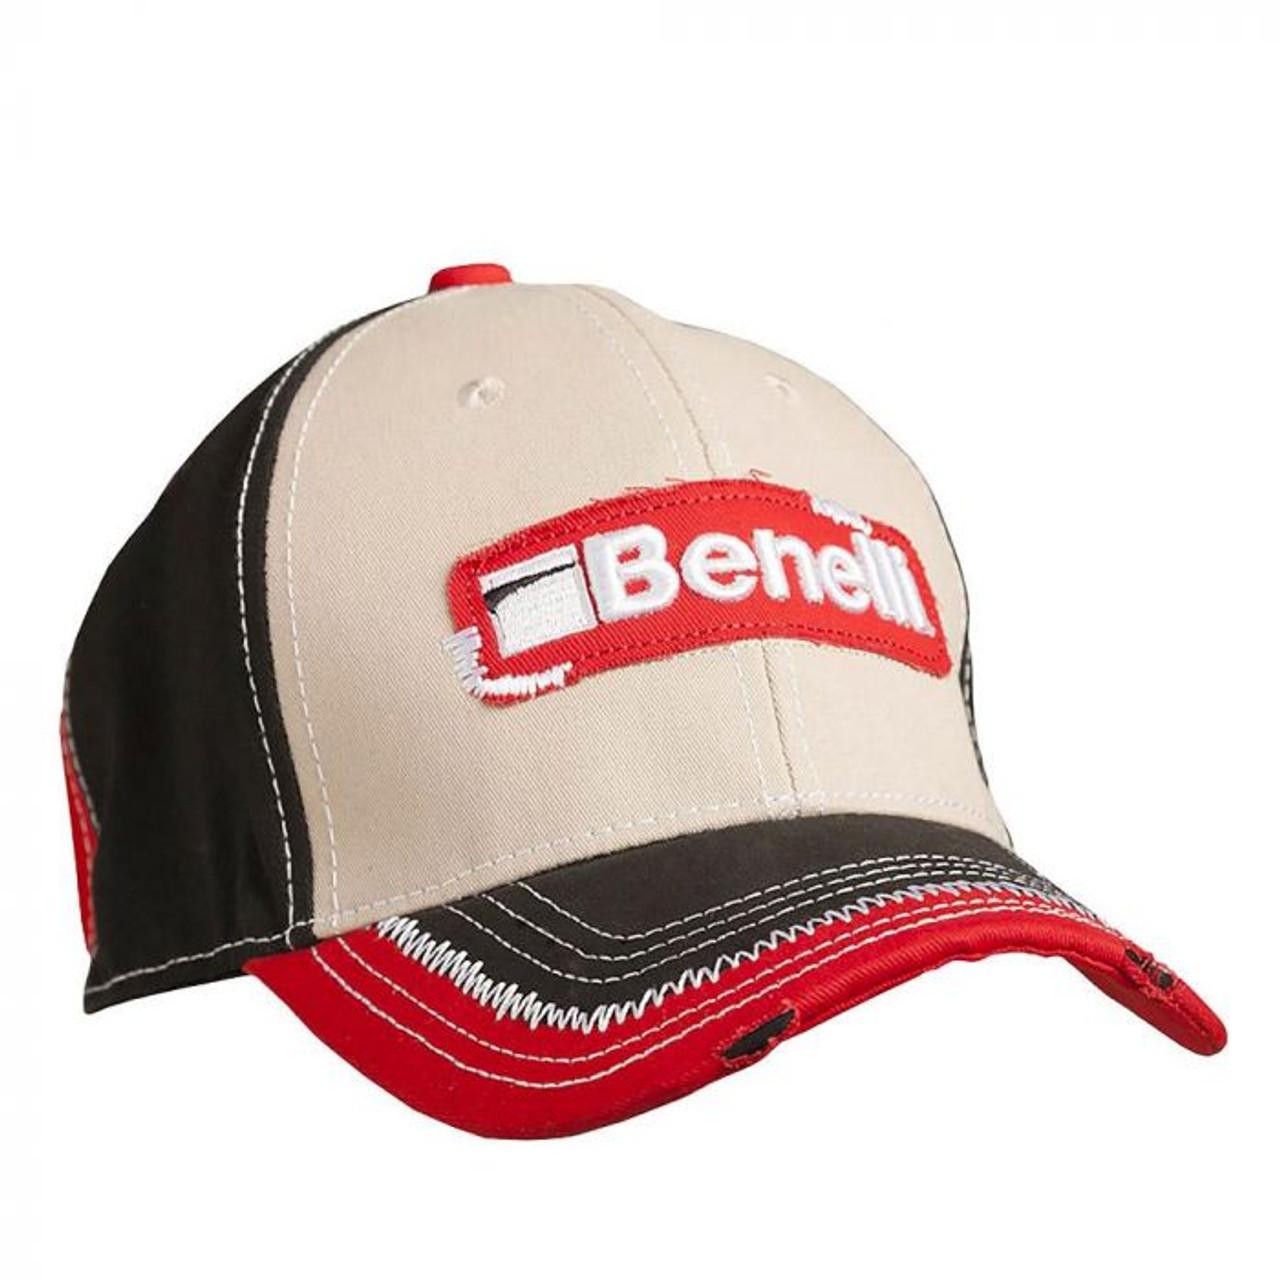 Benelli 3 Tone Hat Red Black and Khaki Distressed M/L 93202